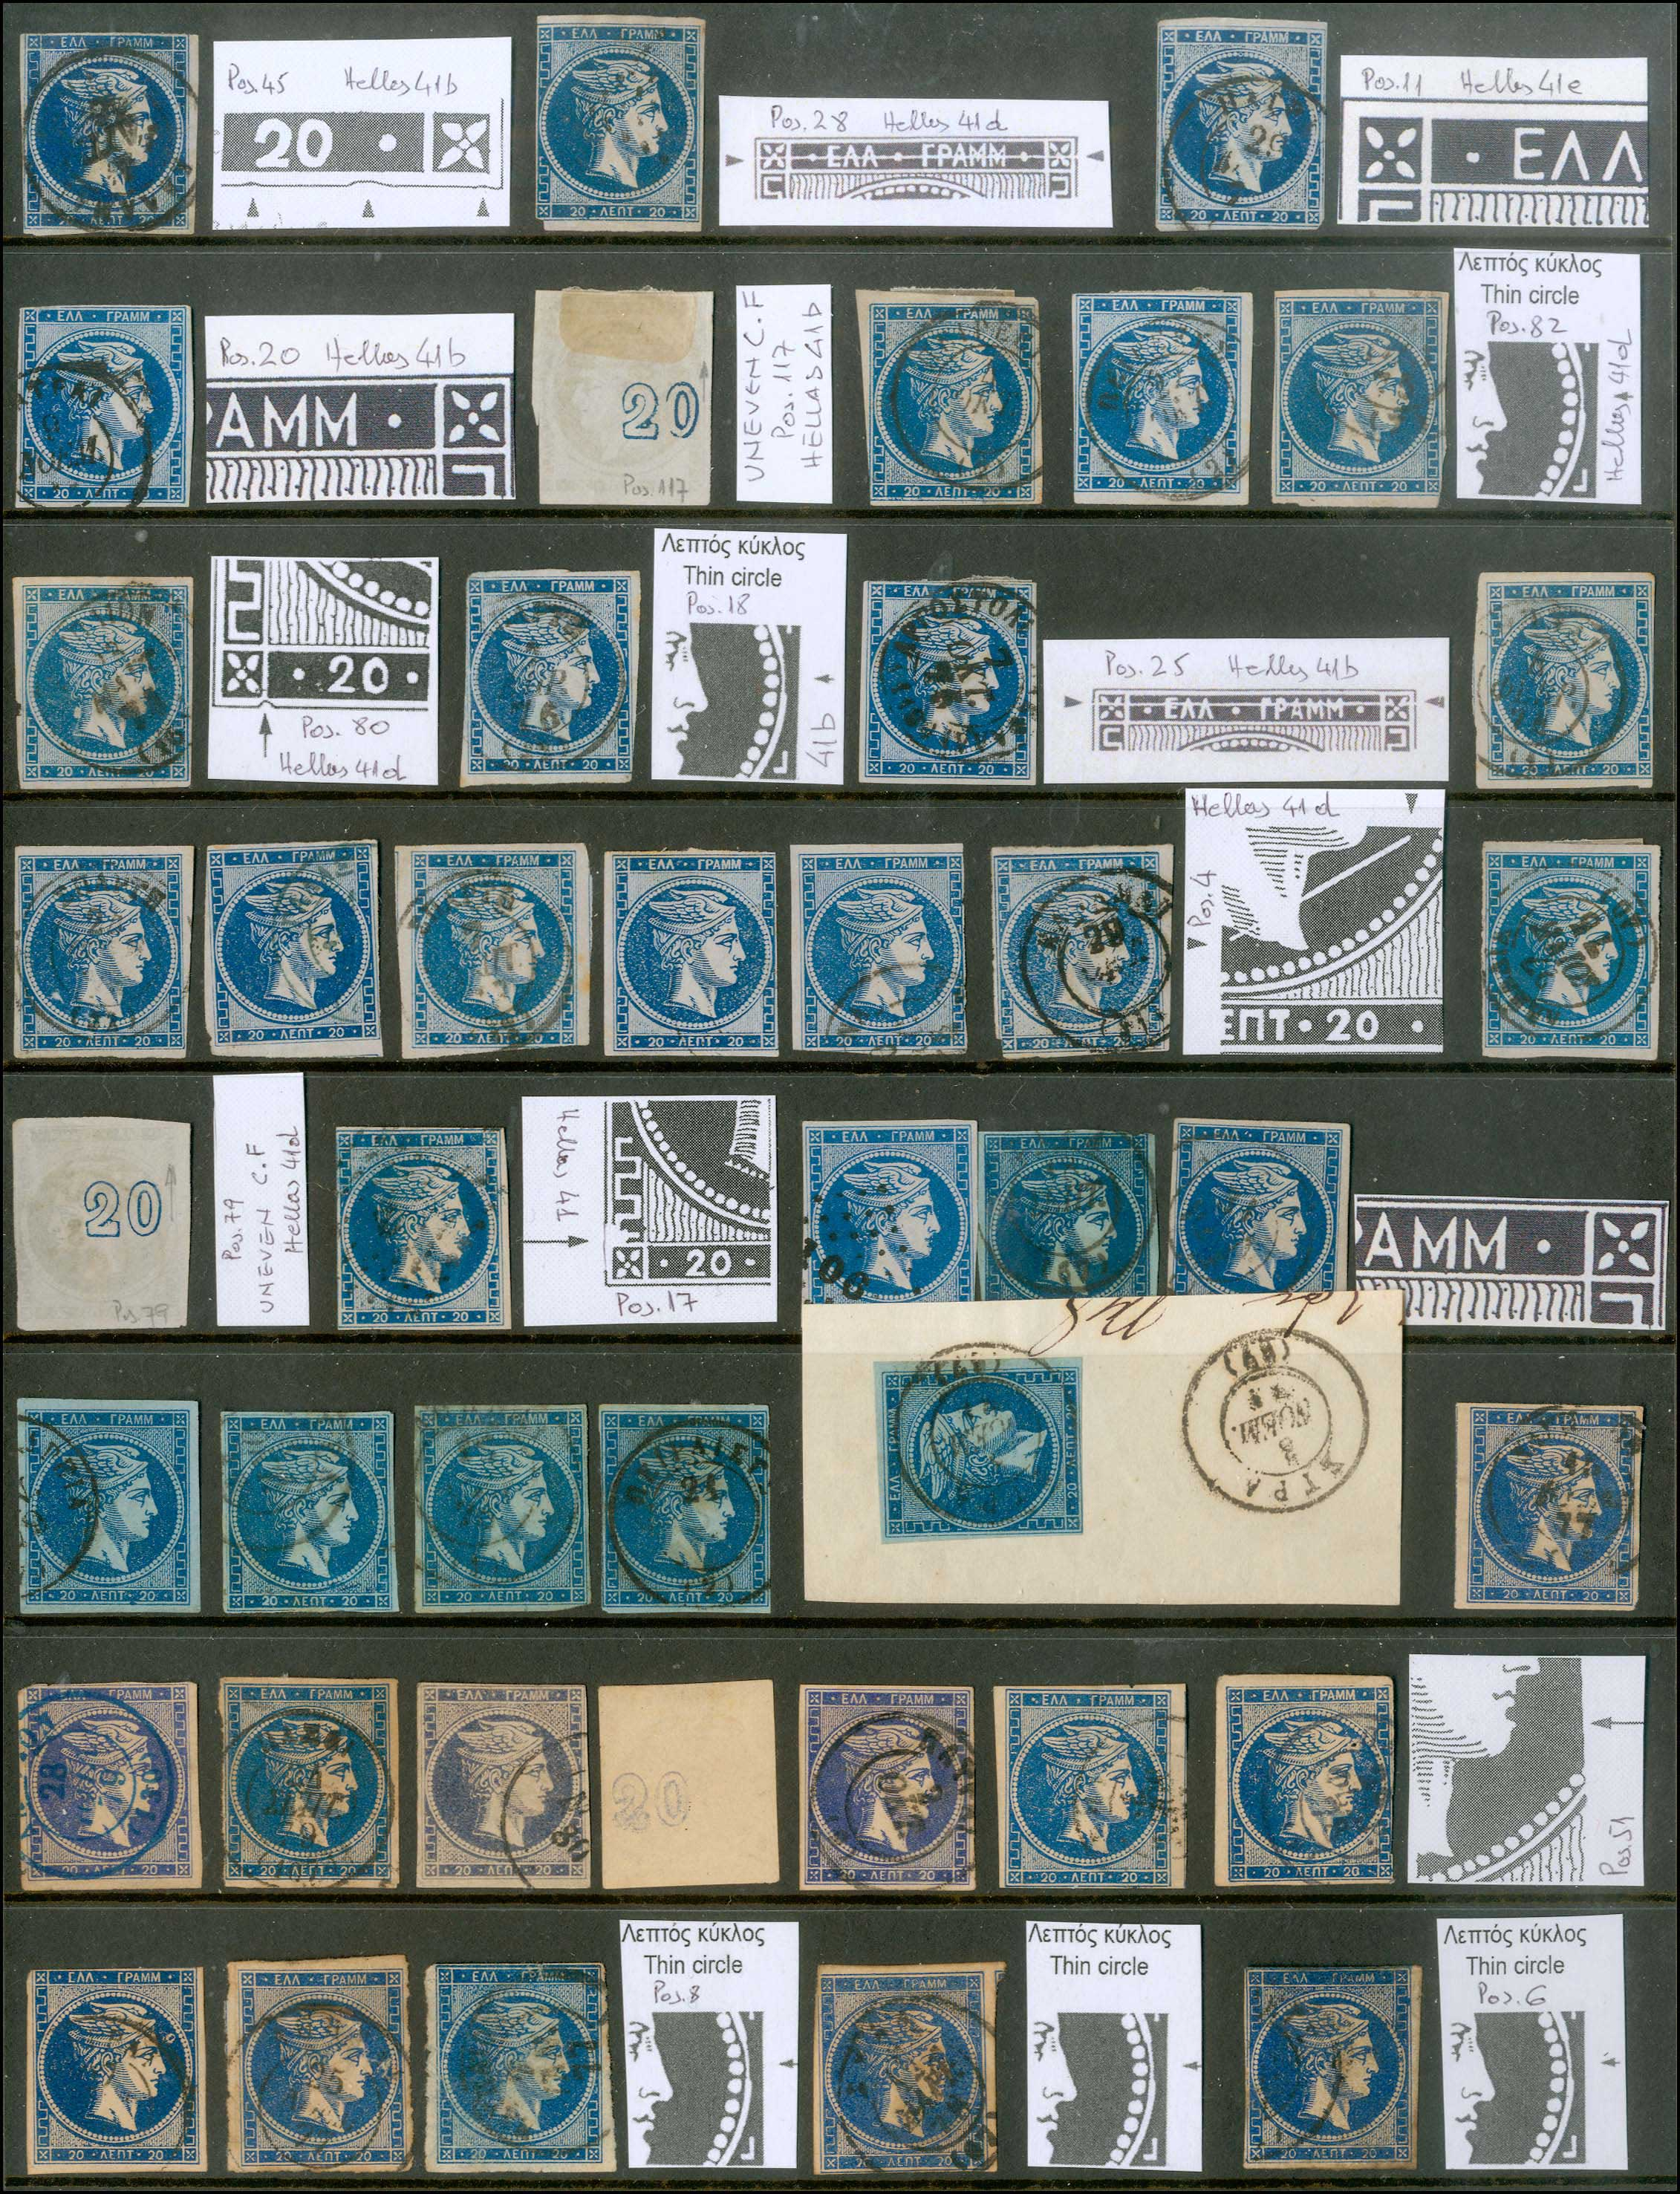 Lot 4 - GREECE-  LARGE HERMES HEAD large hermes head -  A. Karamitsos Public Auction 630 General Stamp Sale